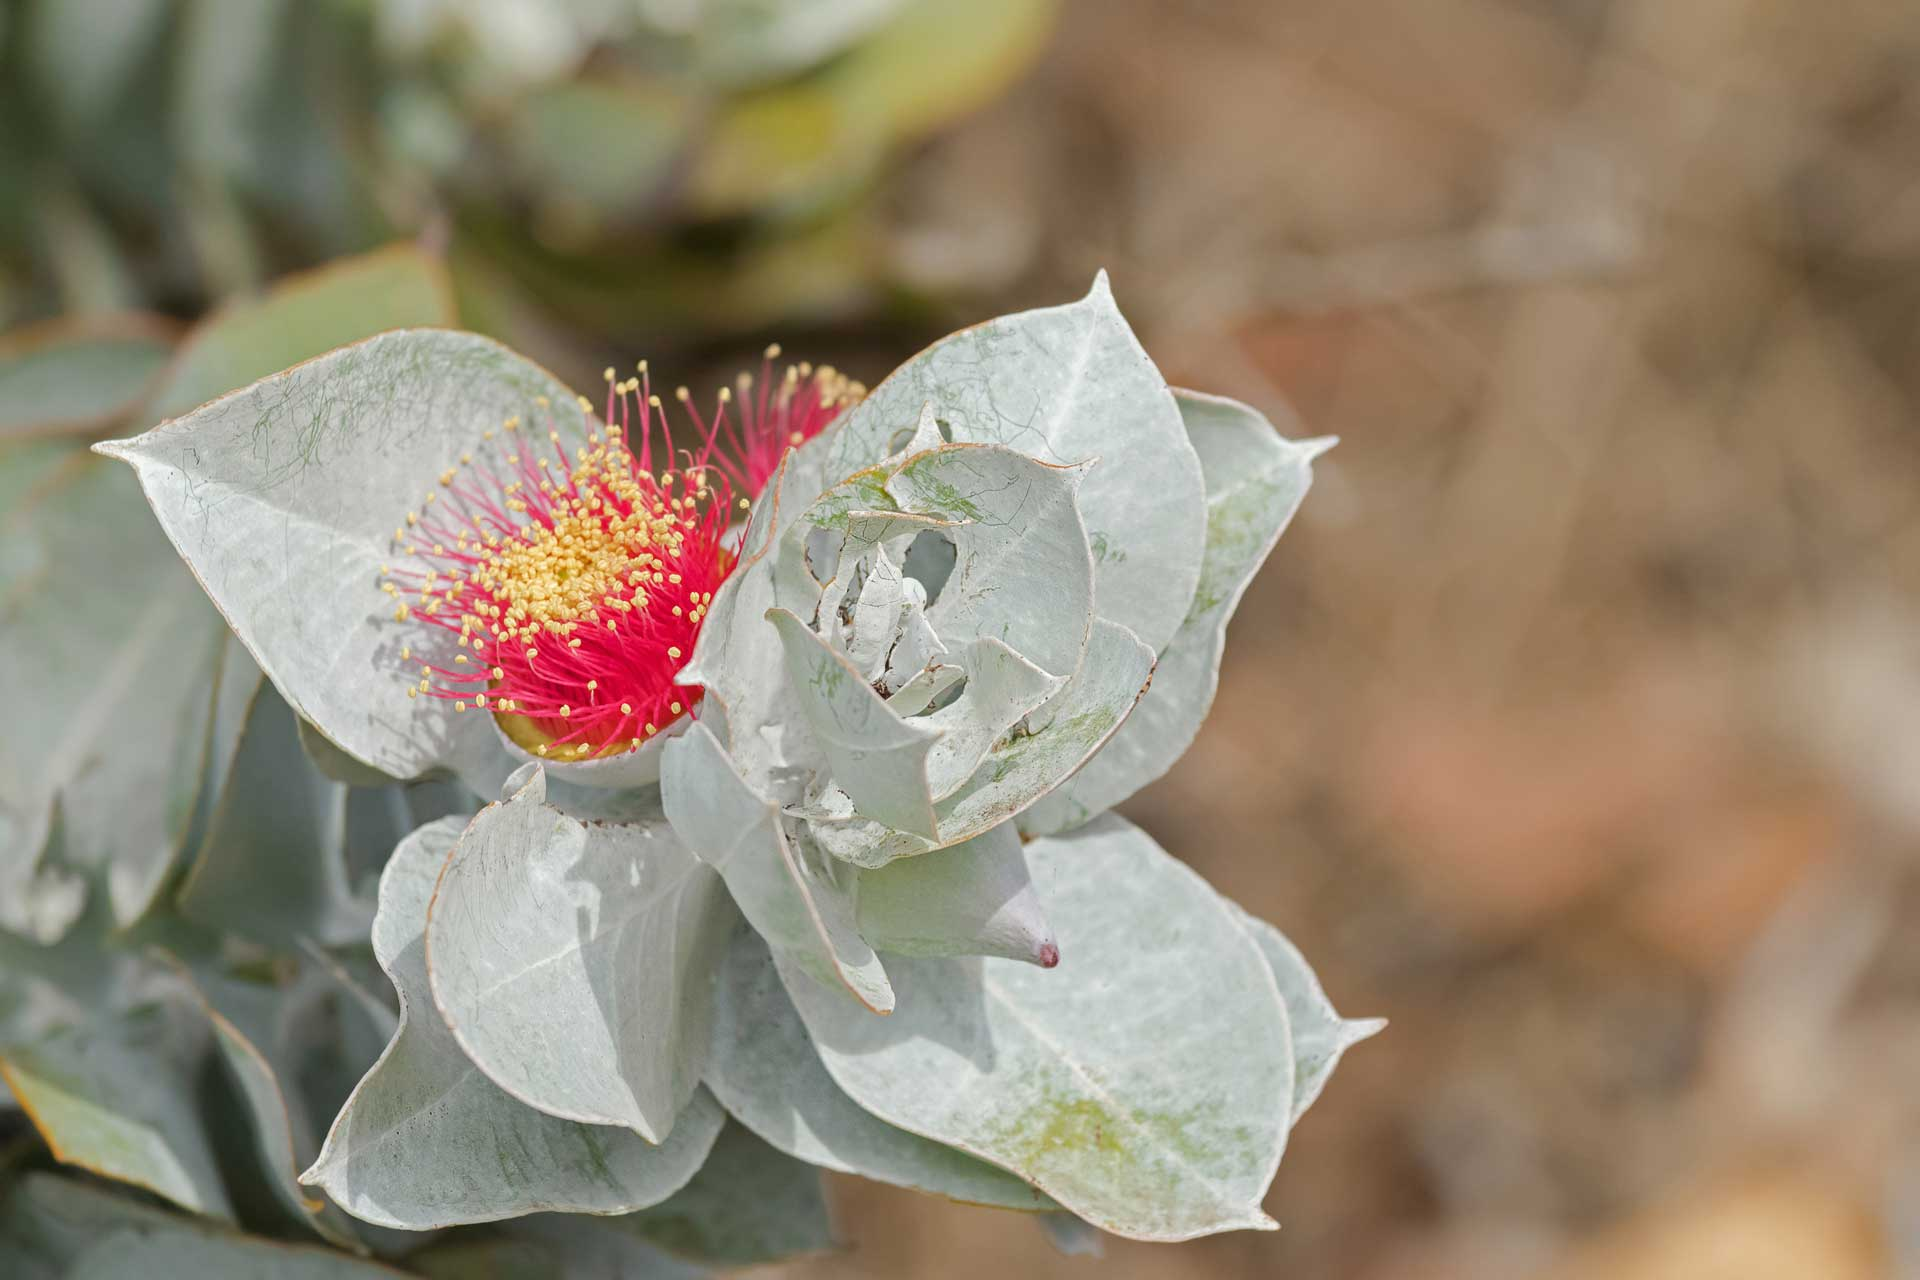 A eucalypt flower